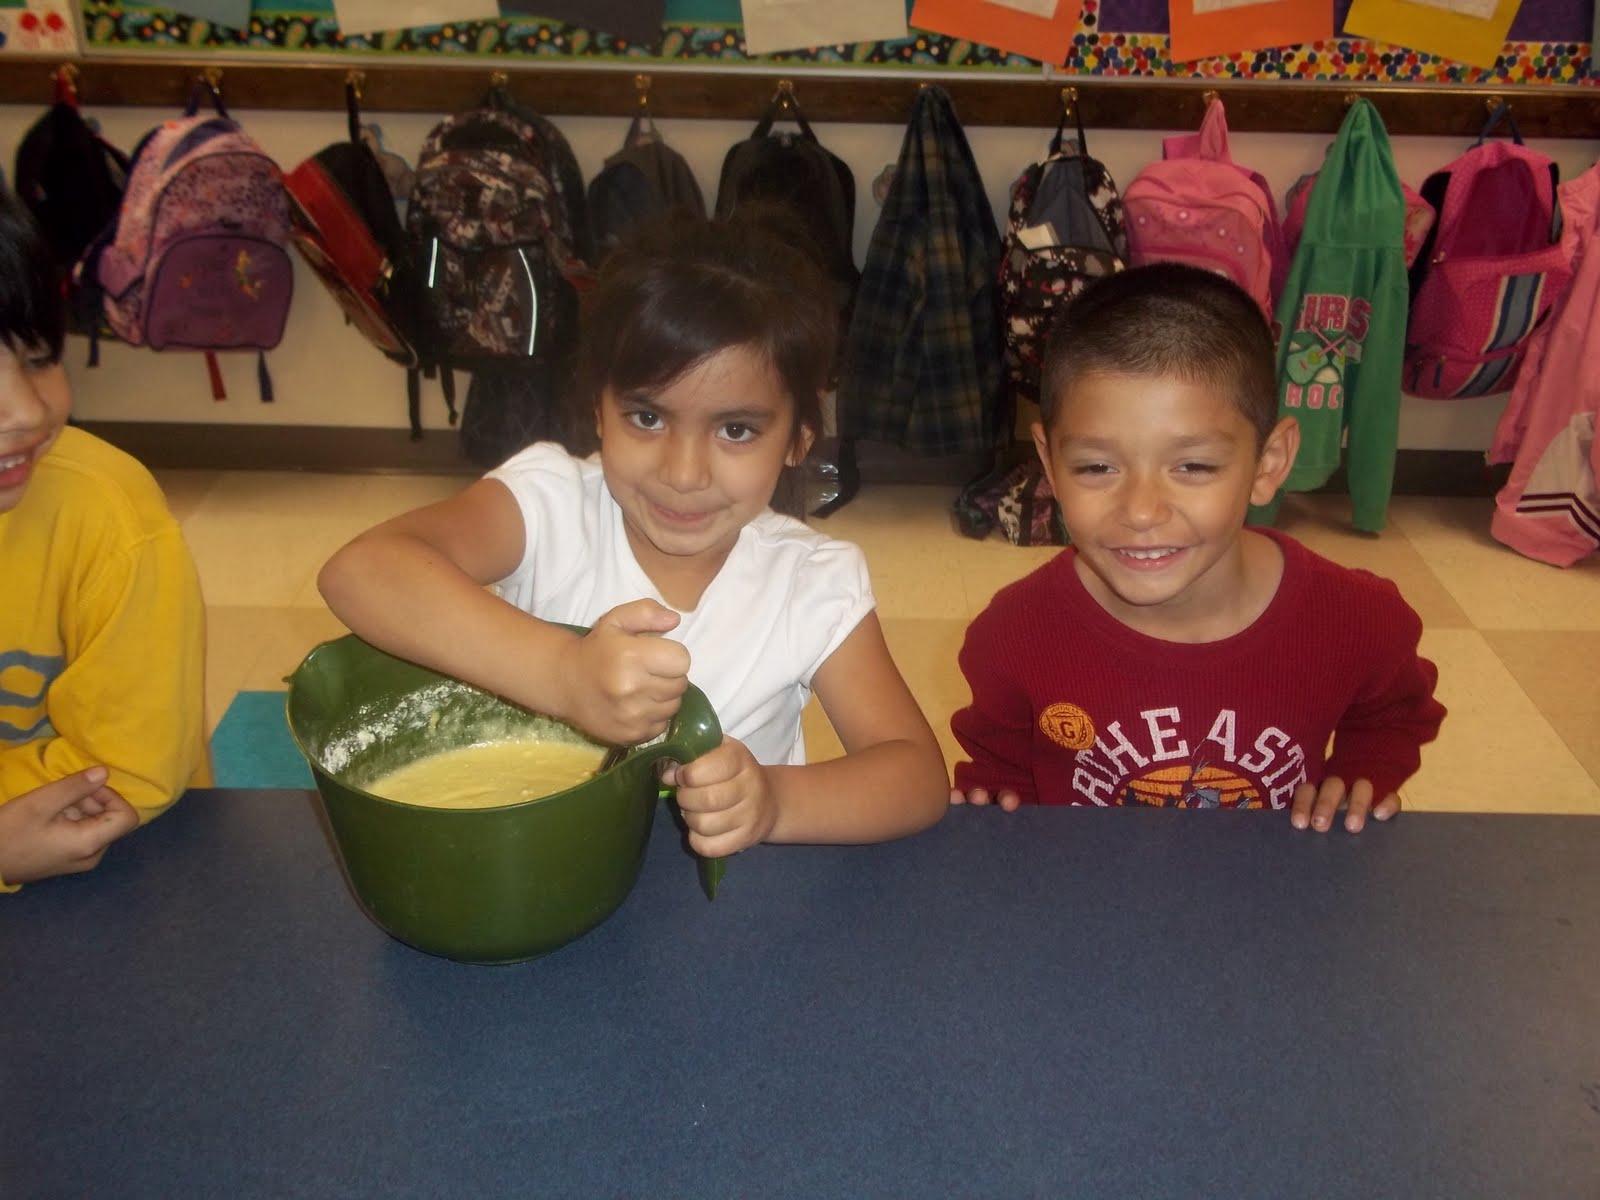 Kinder Garden: Mrs. Wood's Kindergarten Class: Upside Down Day